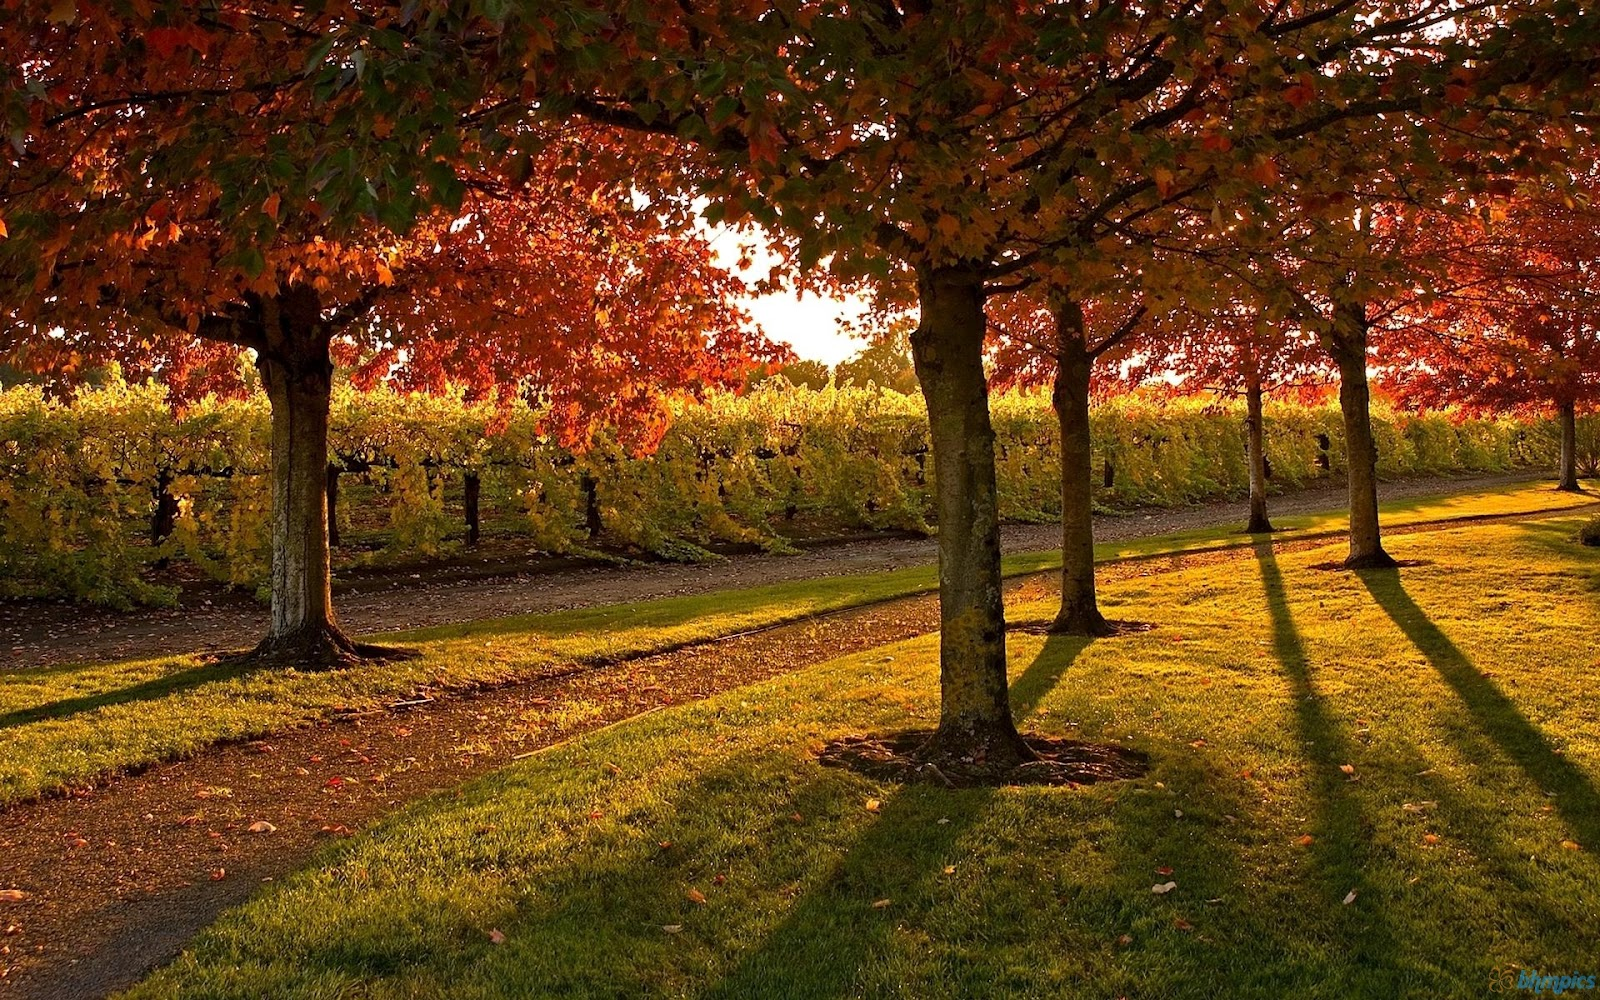 Scenic Wallpaper Autumn Scenic Wallpaper download for Desktop 1600x1000